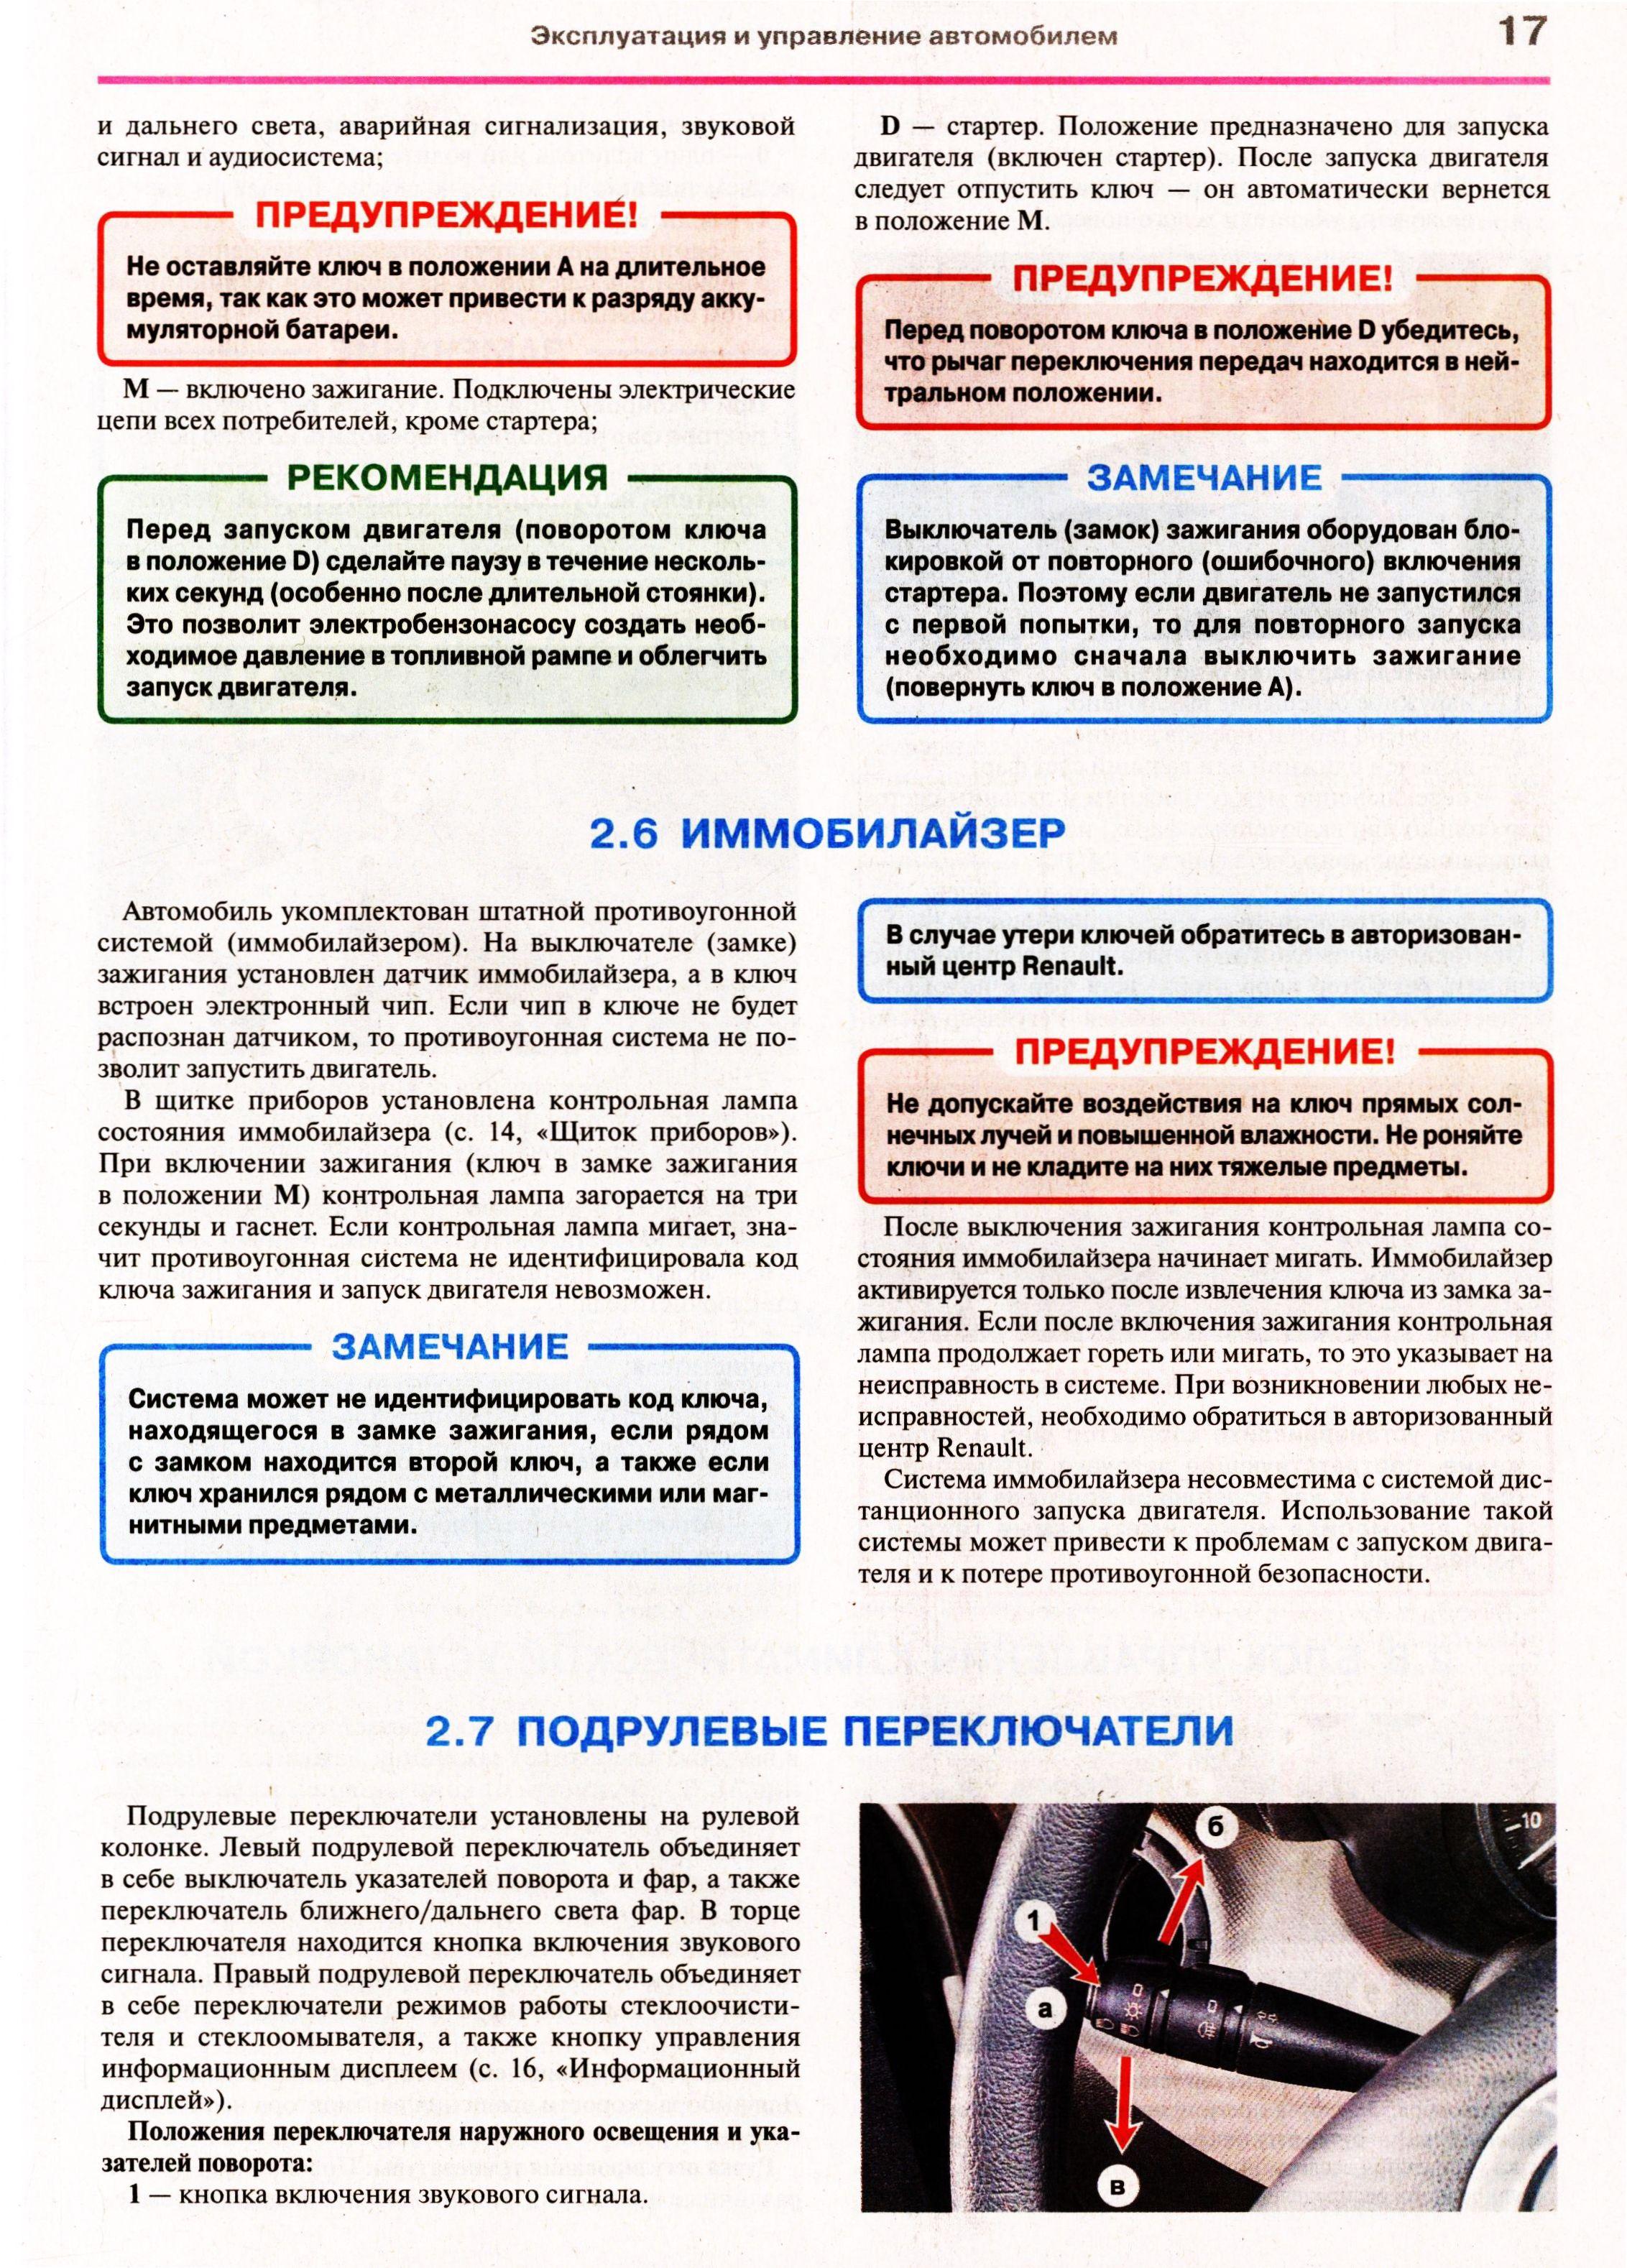 руководство по эксплуатации и ремонту рено сандеро 2015г